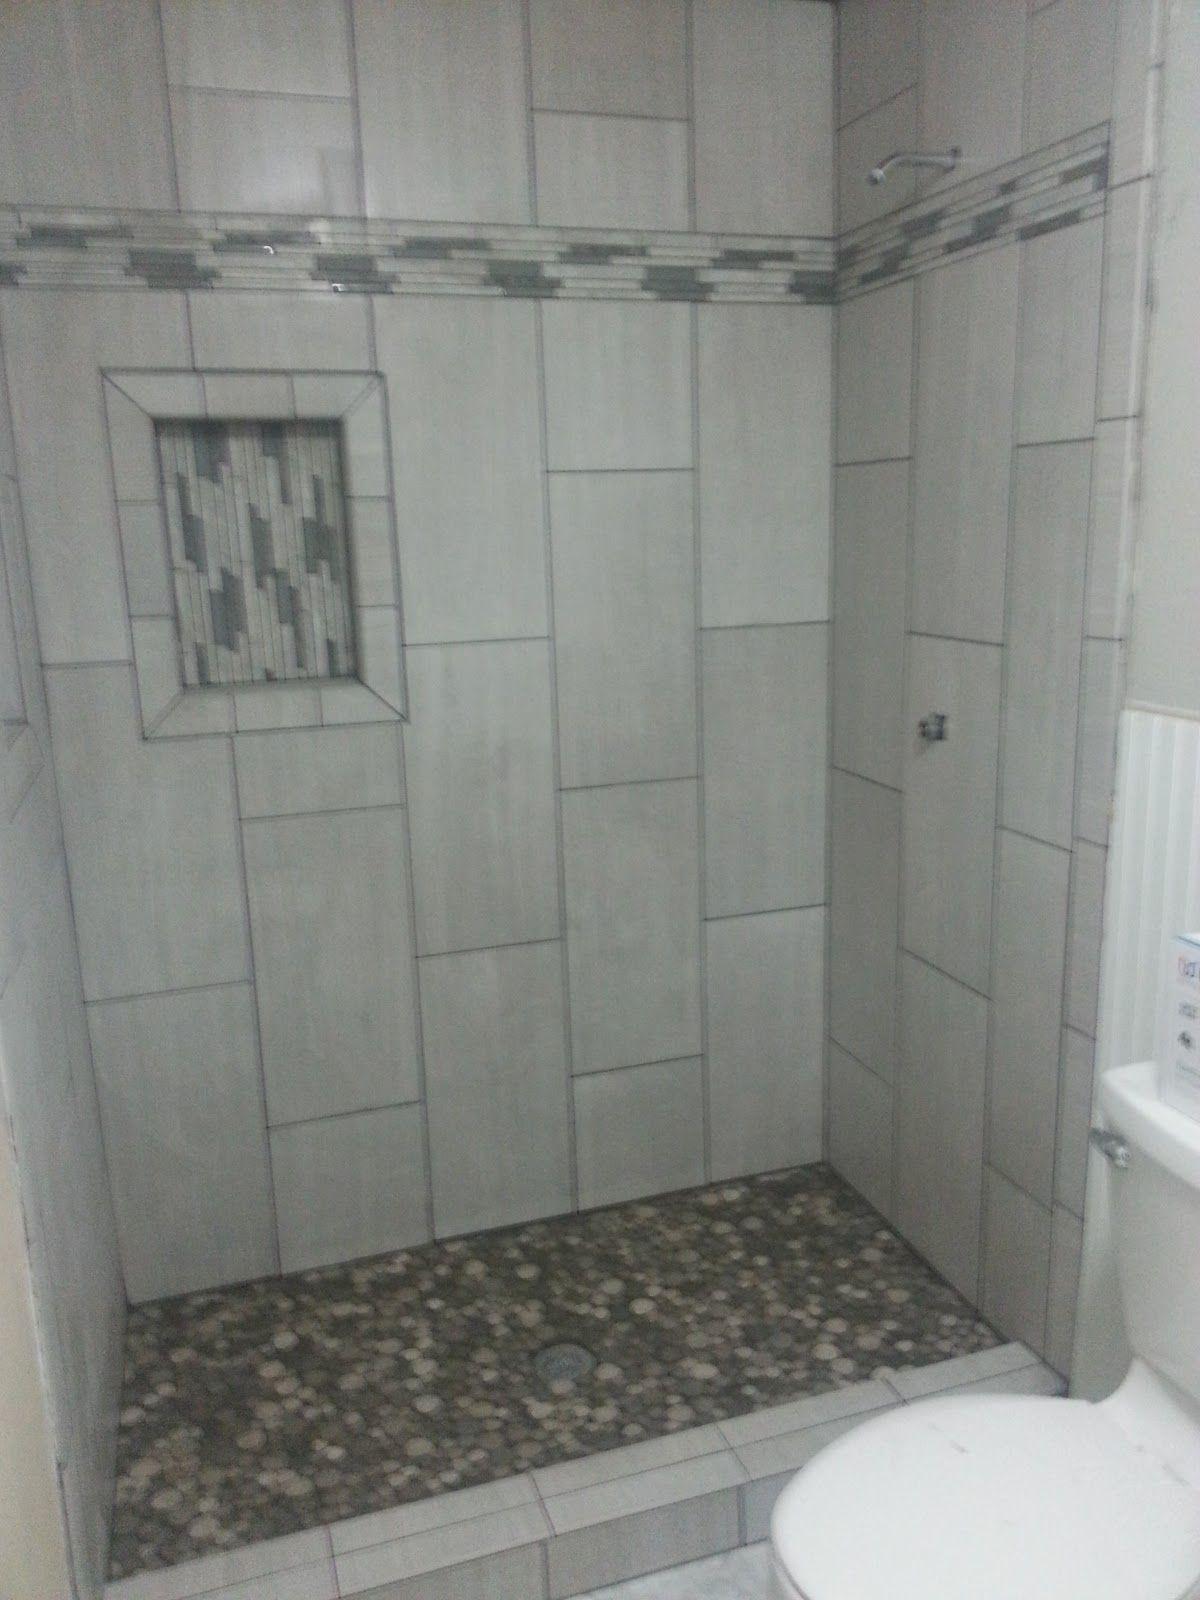 Leonia Silver Tile For Dining Floor Diy Home Bathroom